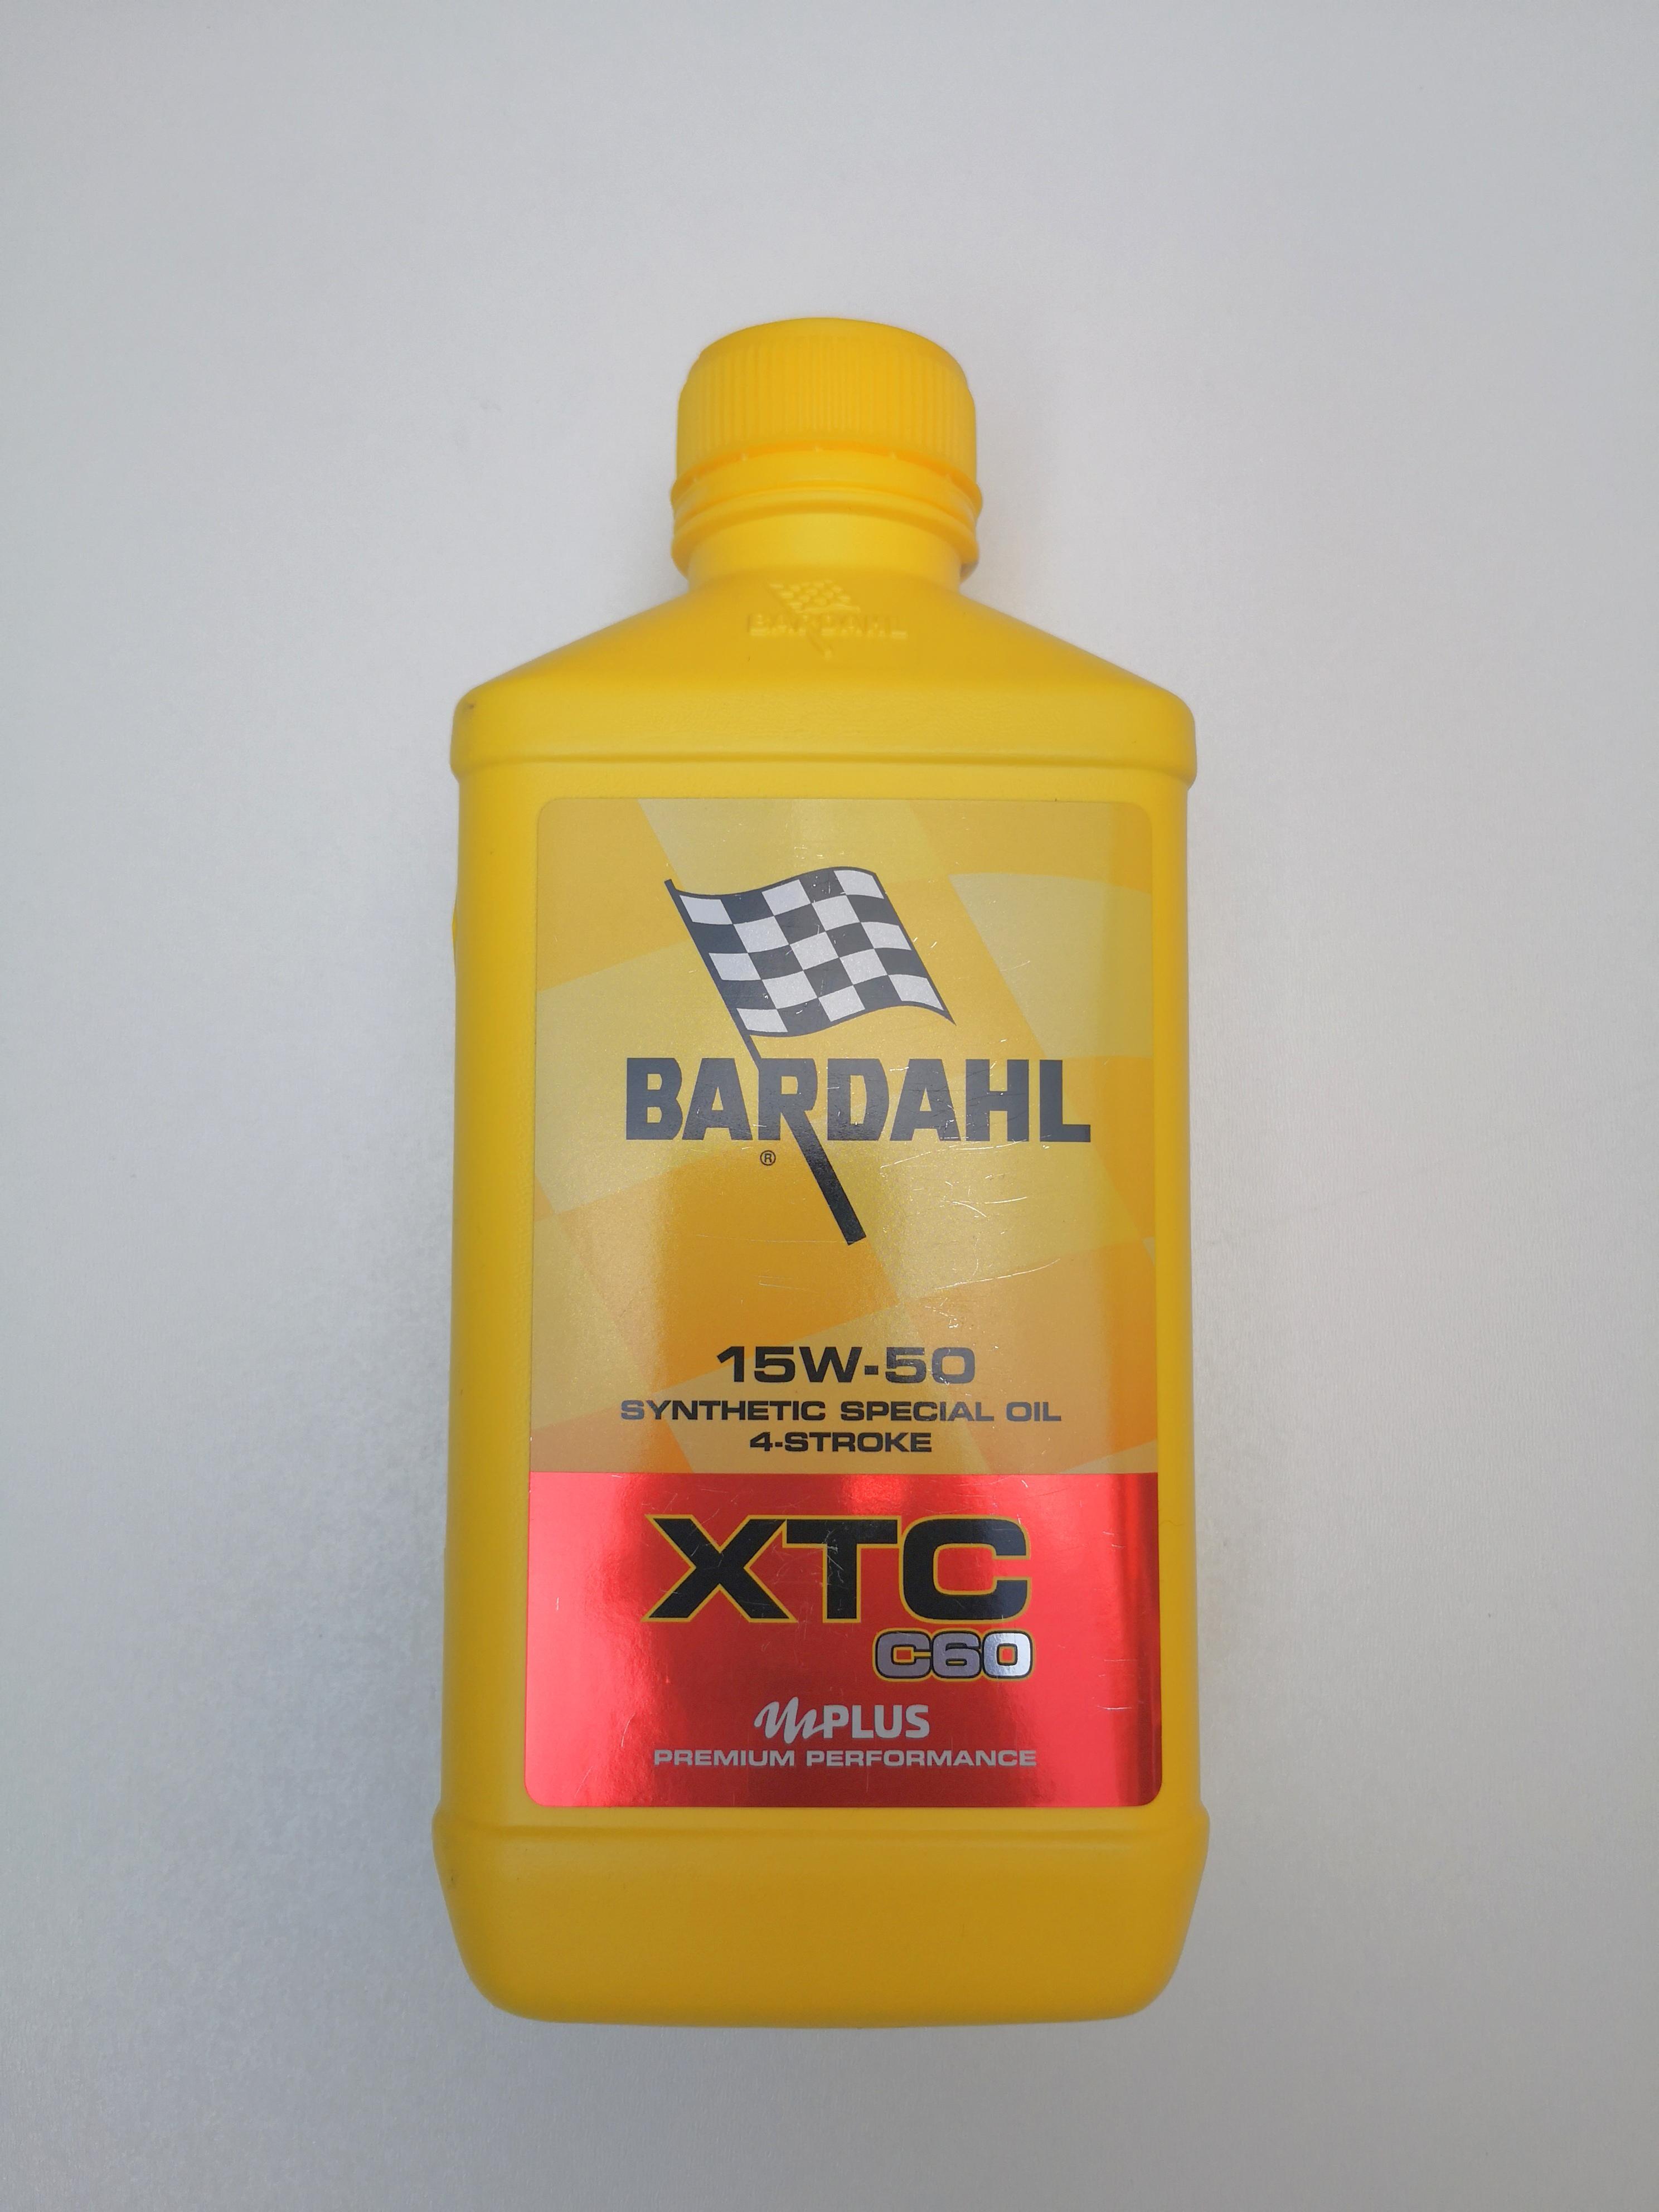 OLIO MOTORE BARDAHL XTC C60 per MOTO e SCCOTER 4 TEMPI  - BASE SINTETICA  SAE15W50 - MOTOFORNITURE GF